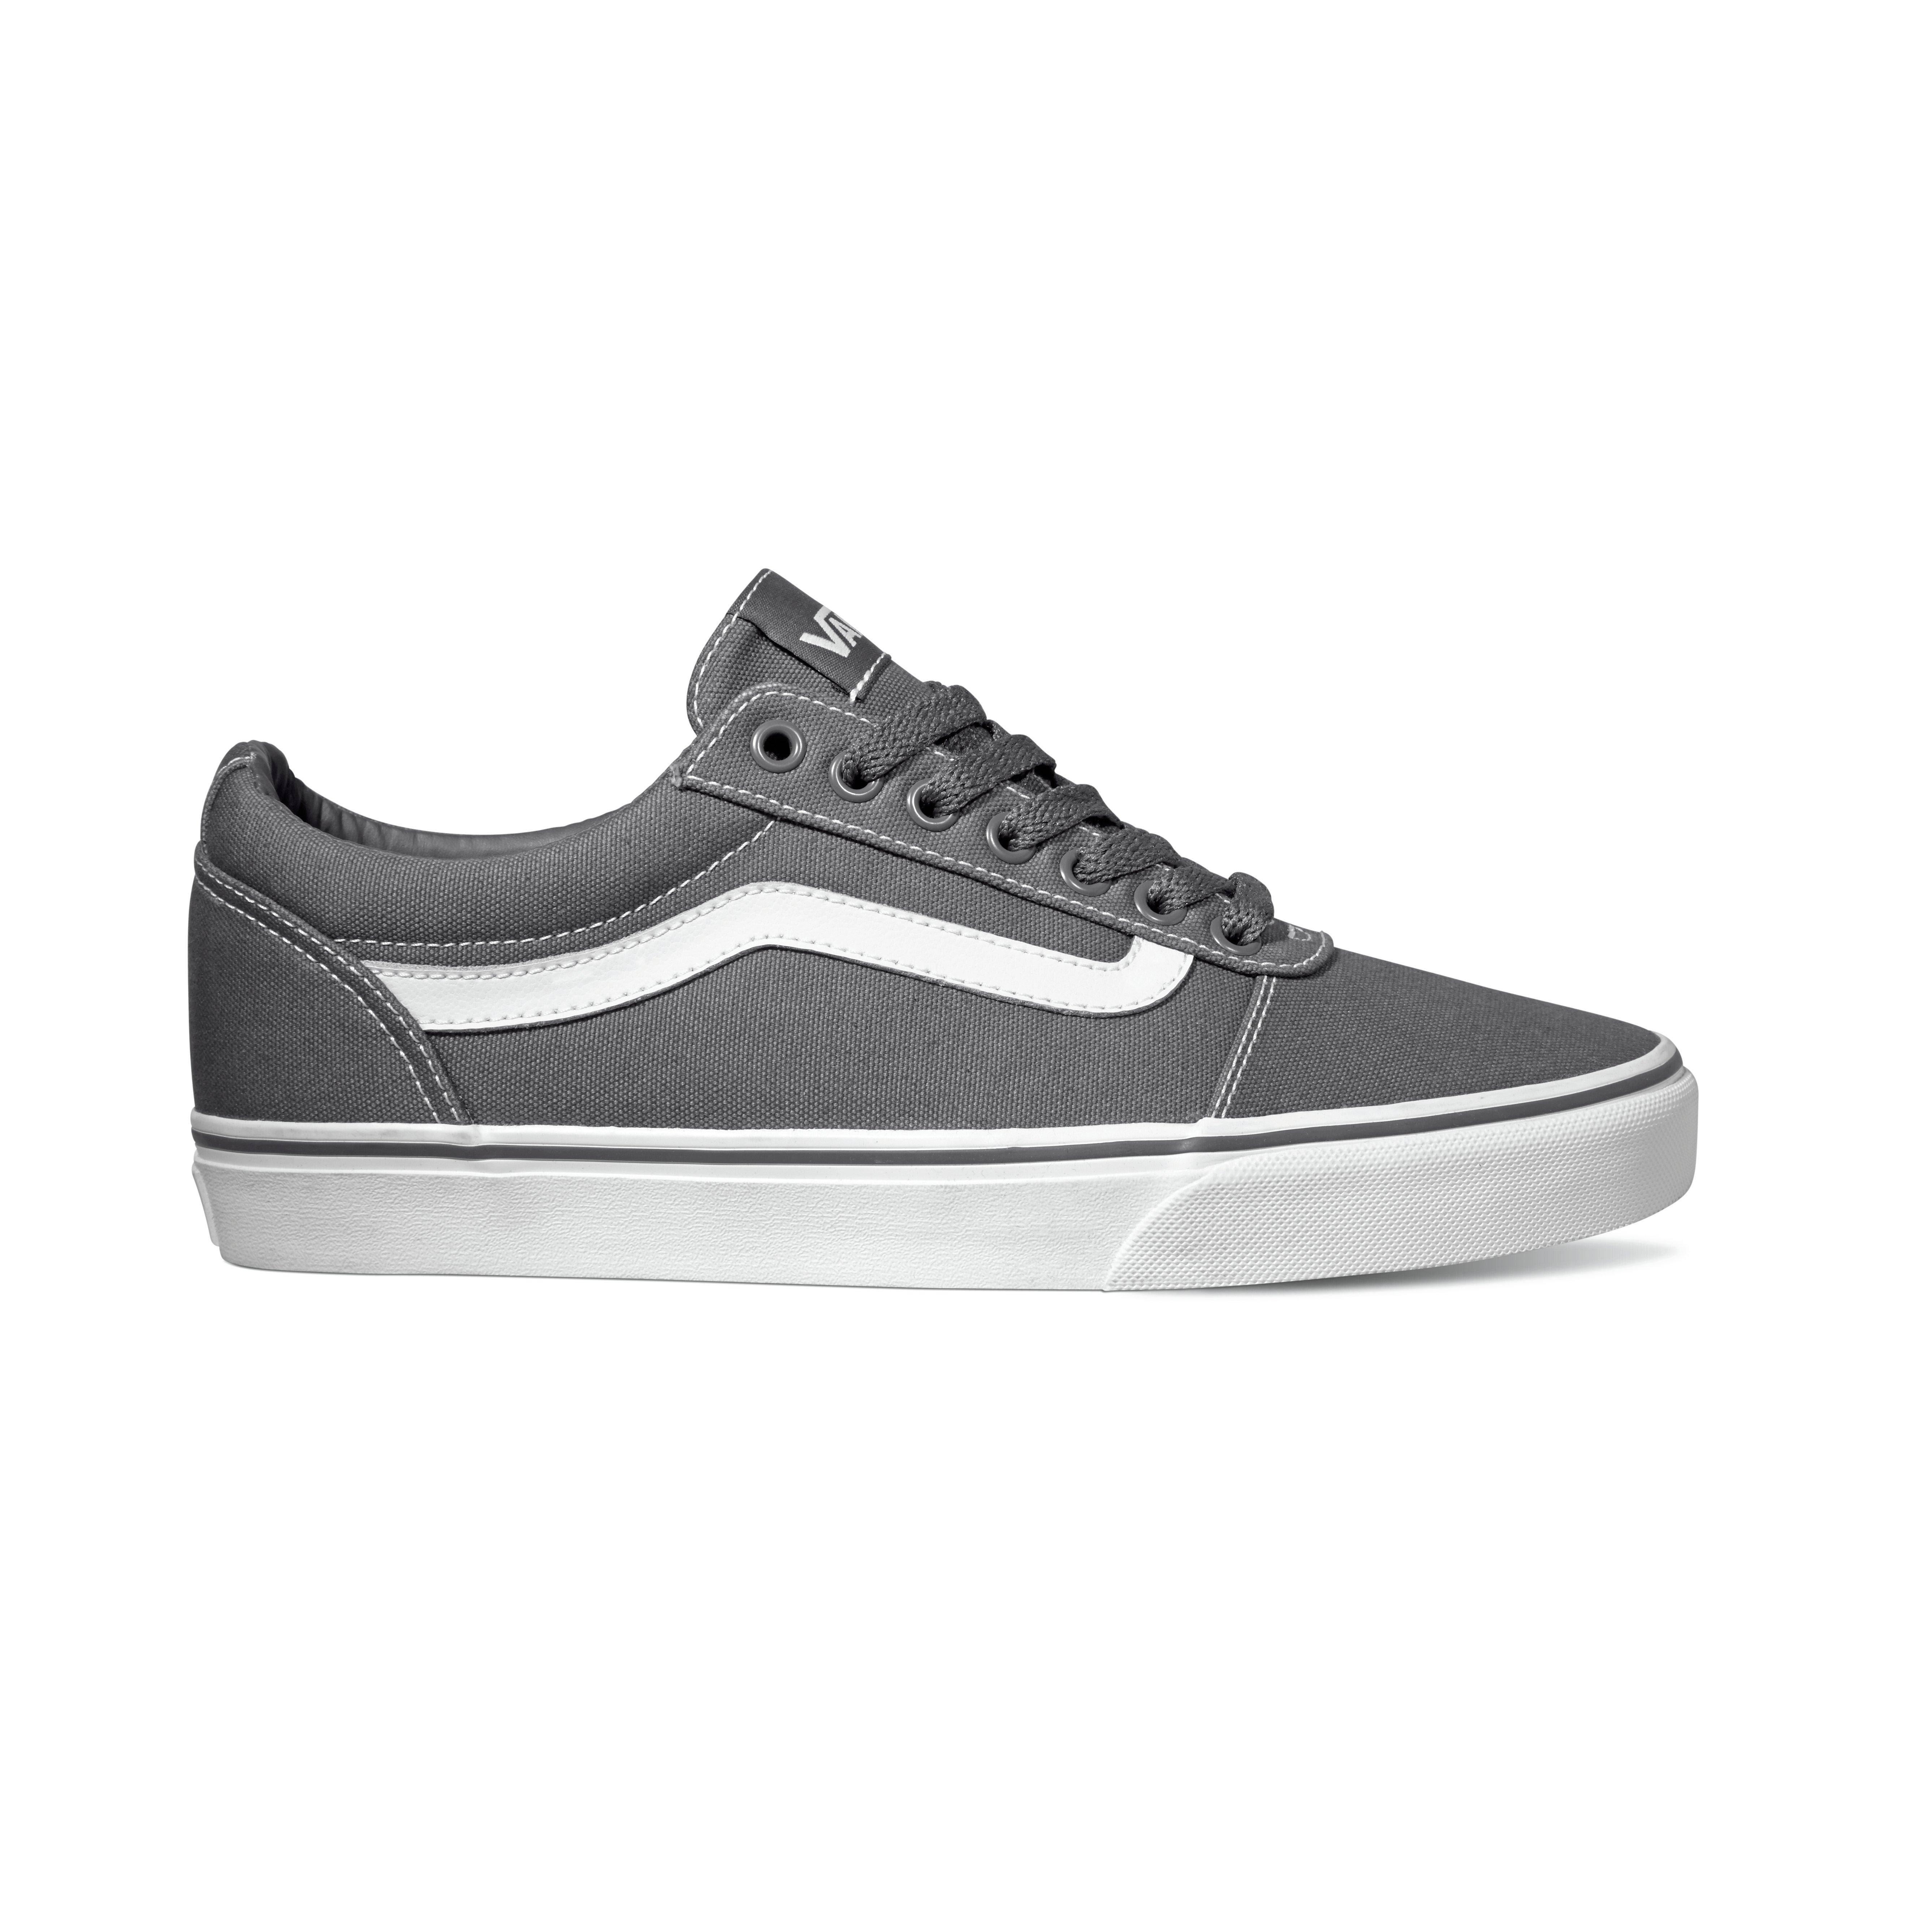 off white Skate Tornado Men Vans 11 Shoes White Grey Ward Canvas Nwb Size CqSnFwU